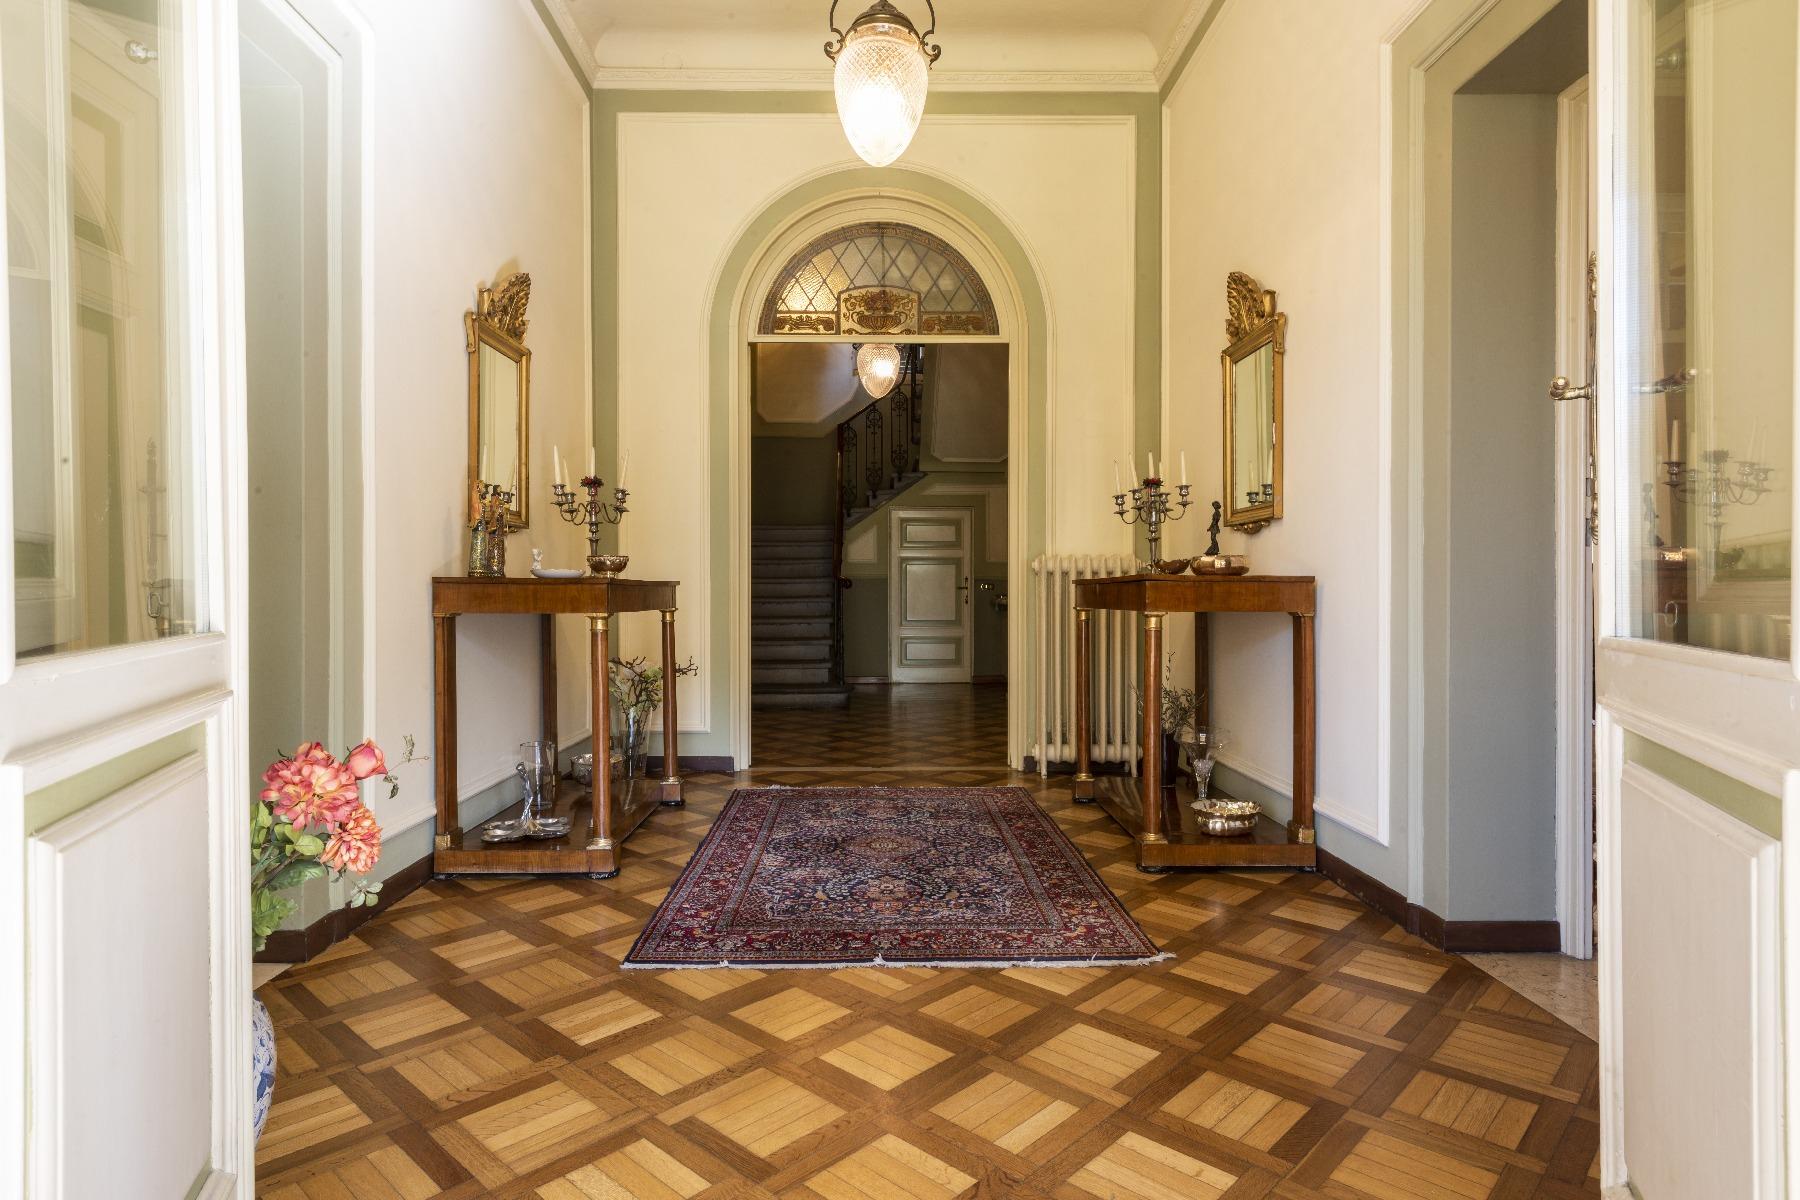 Villa in Vendita a Lucca: 5 locali, 660 mq - Foto 12